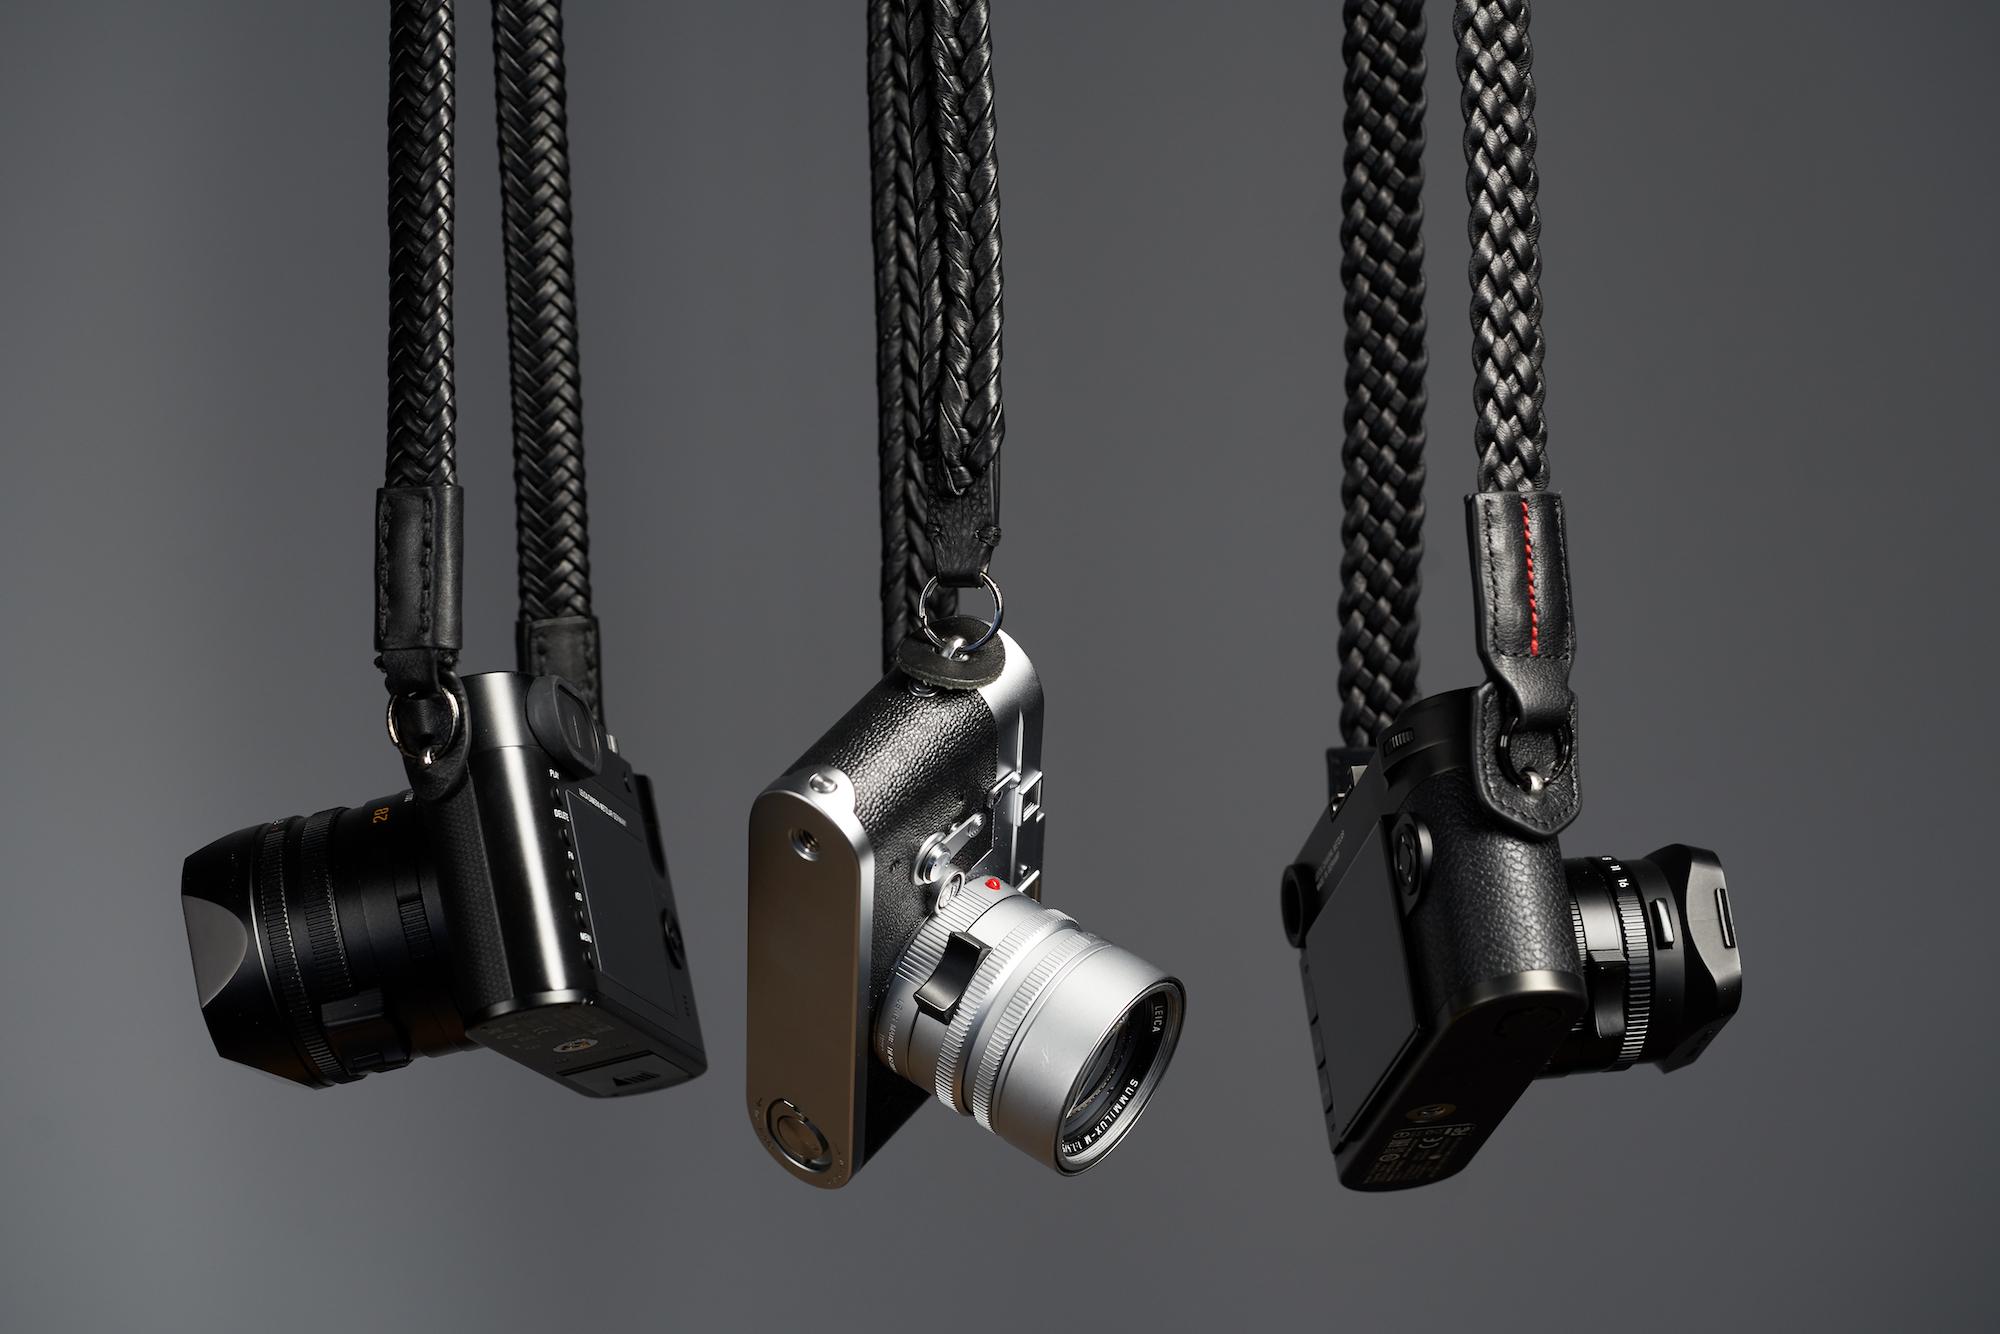 leica camera straps black braided leather vi vante.jpg